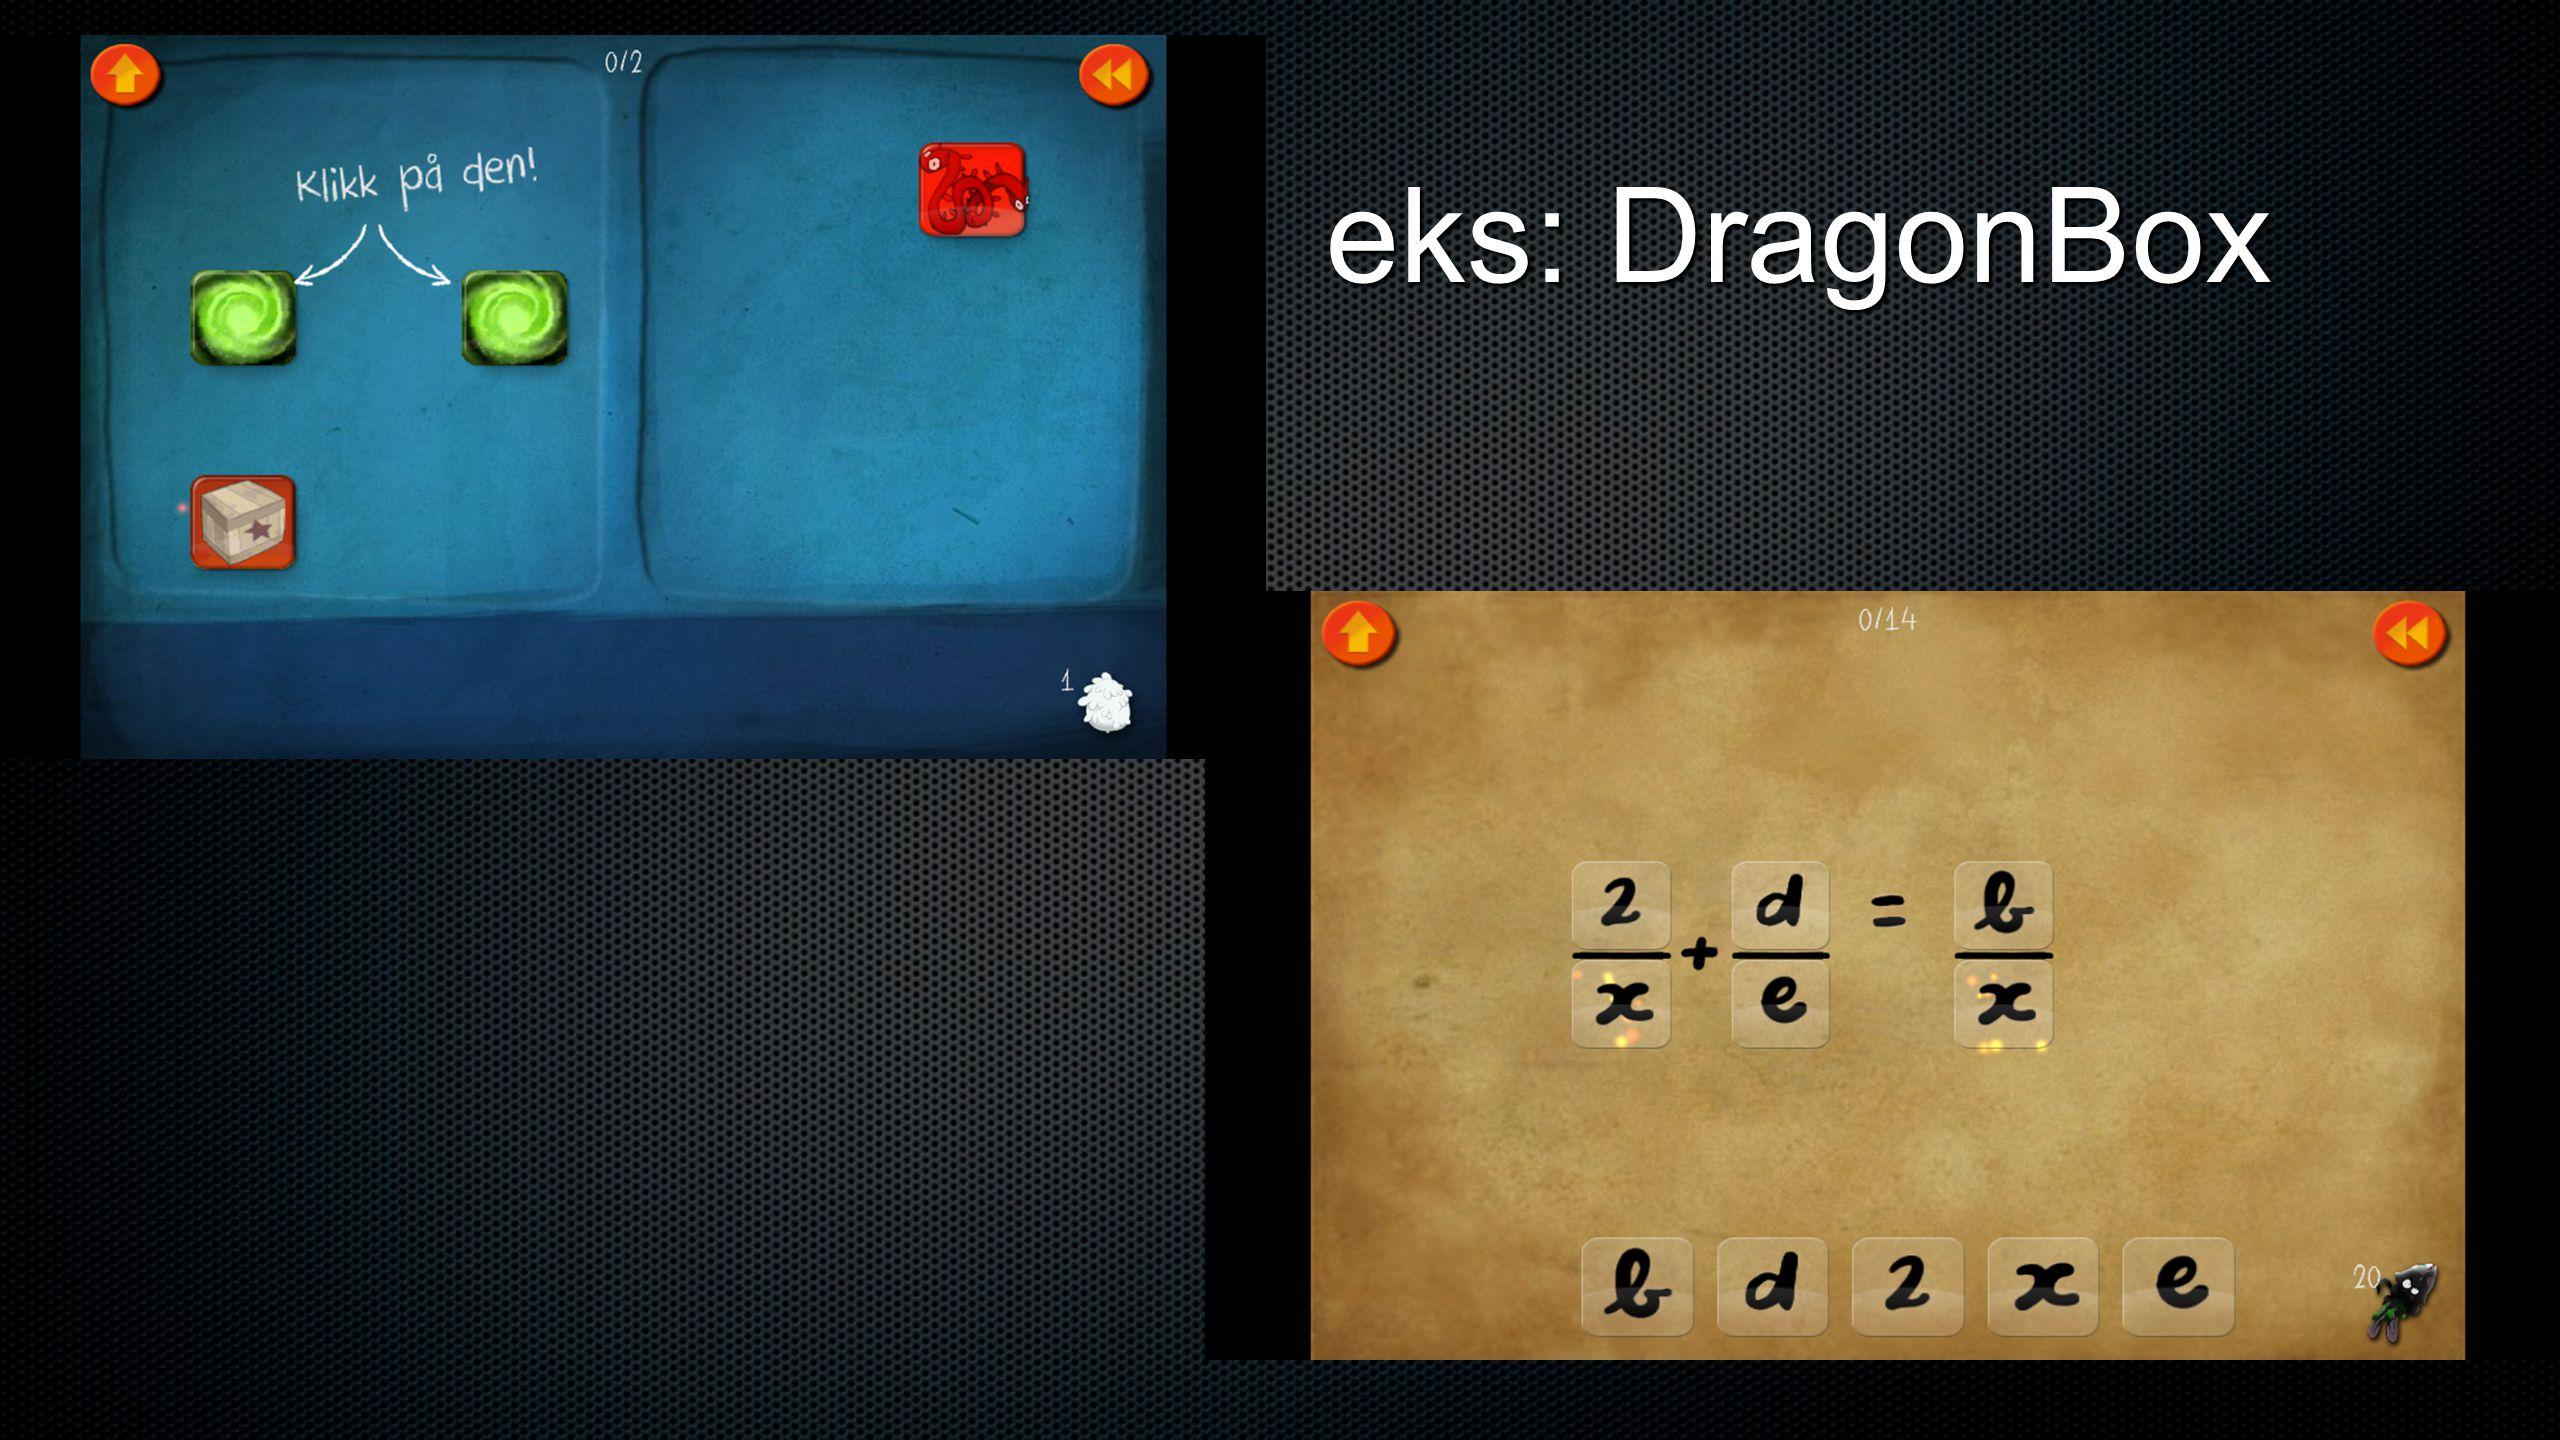 eks: DragonBox